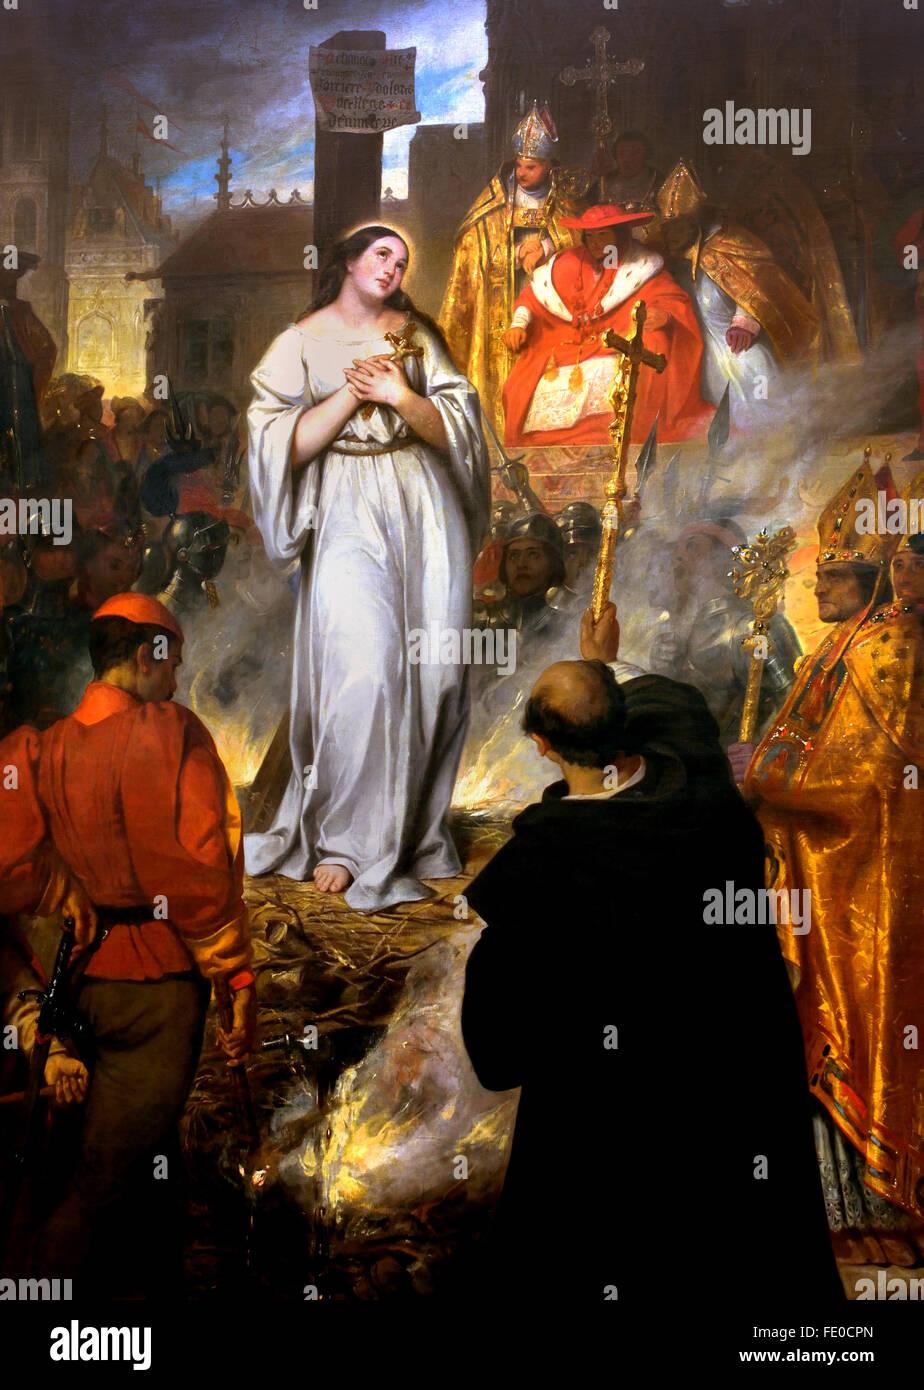 Saint Joan Of Arc's Name